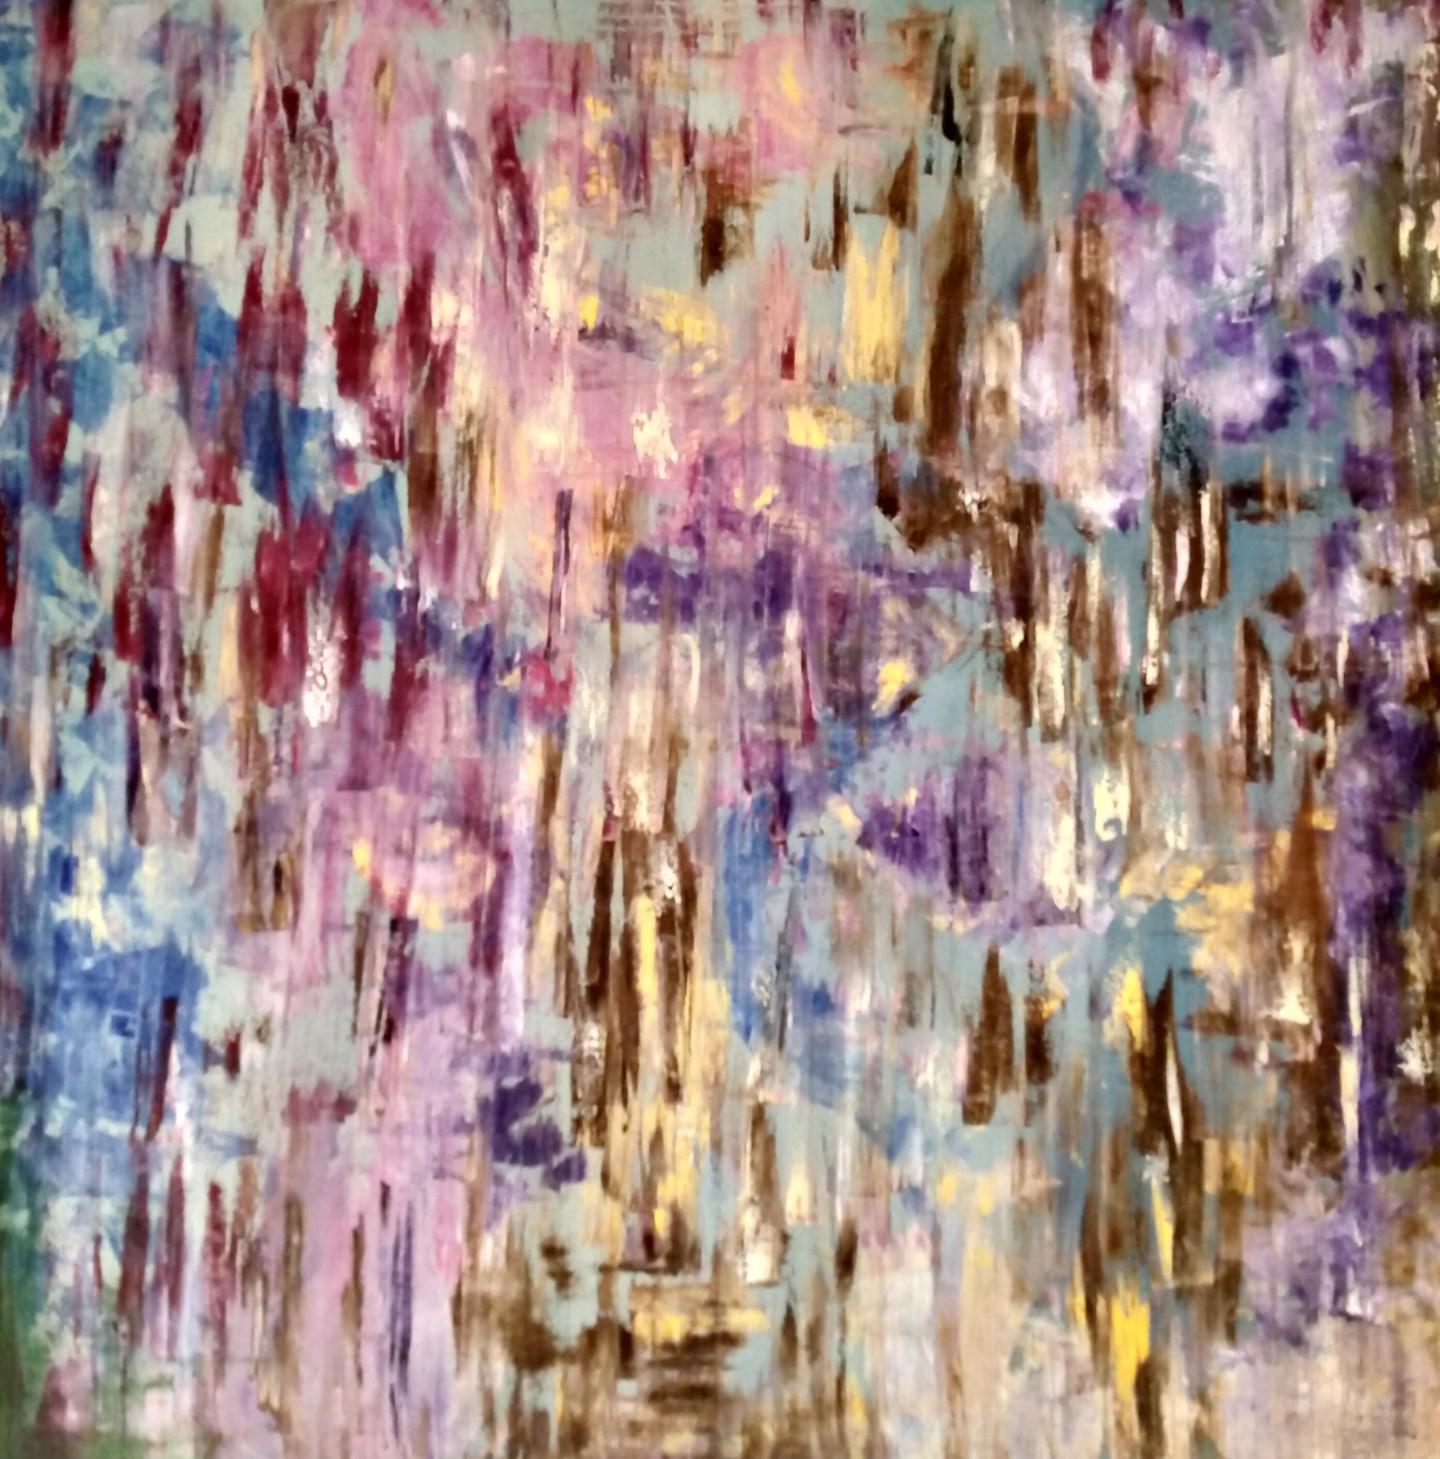 Atignas Art - Fading colors of Humanity